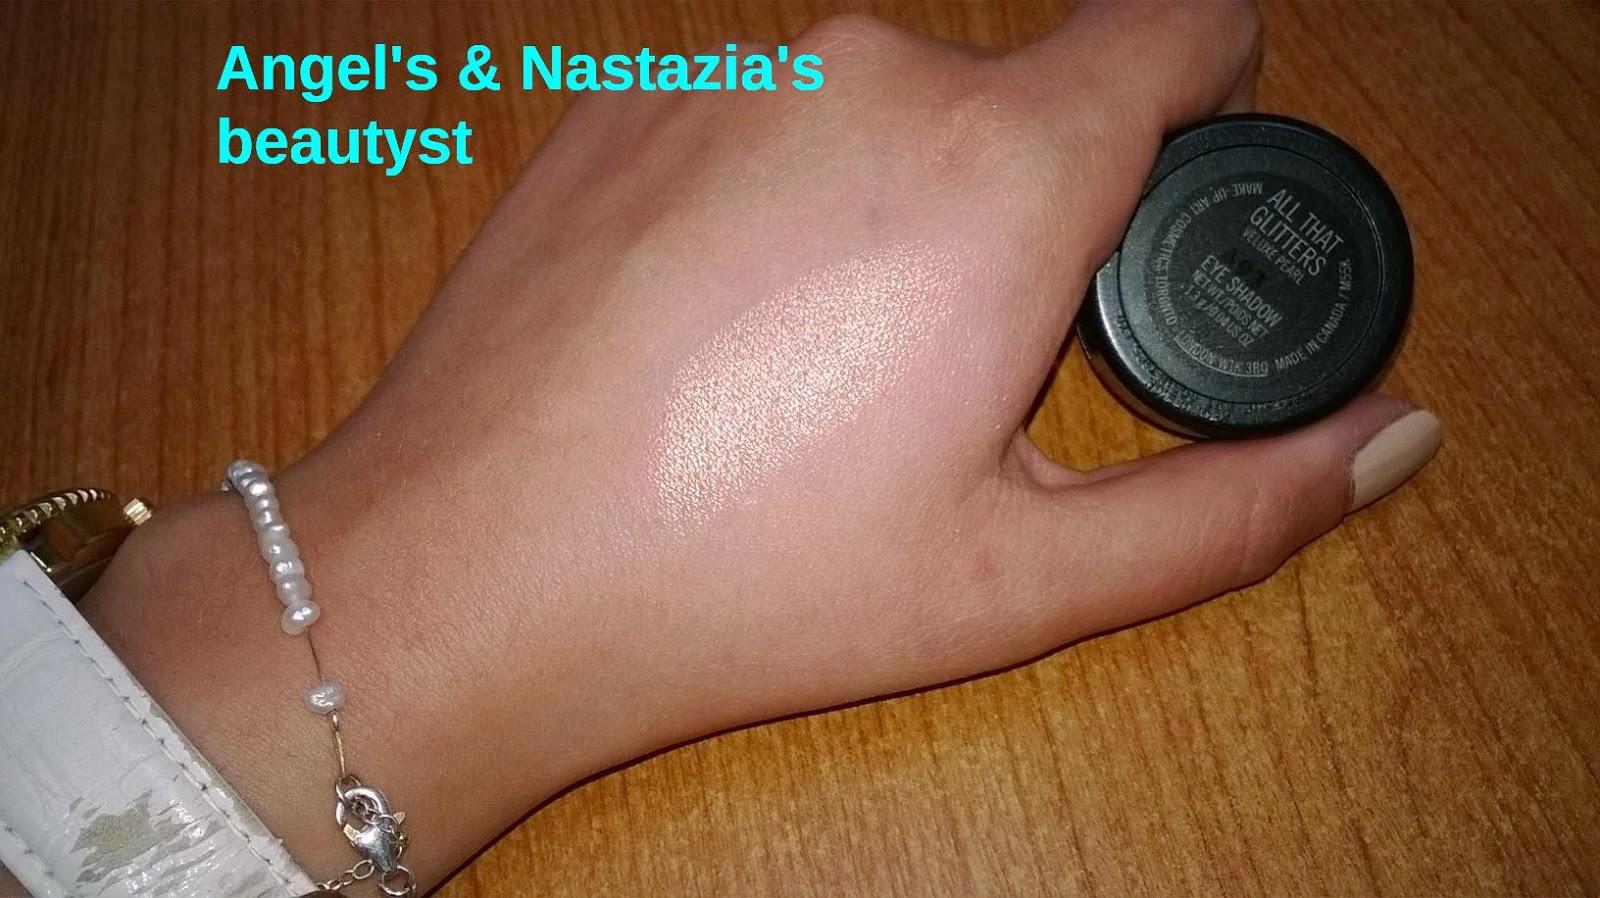 http://angelandnastaziabeautyst.blogspot.gr